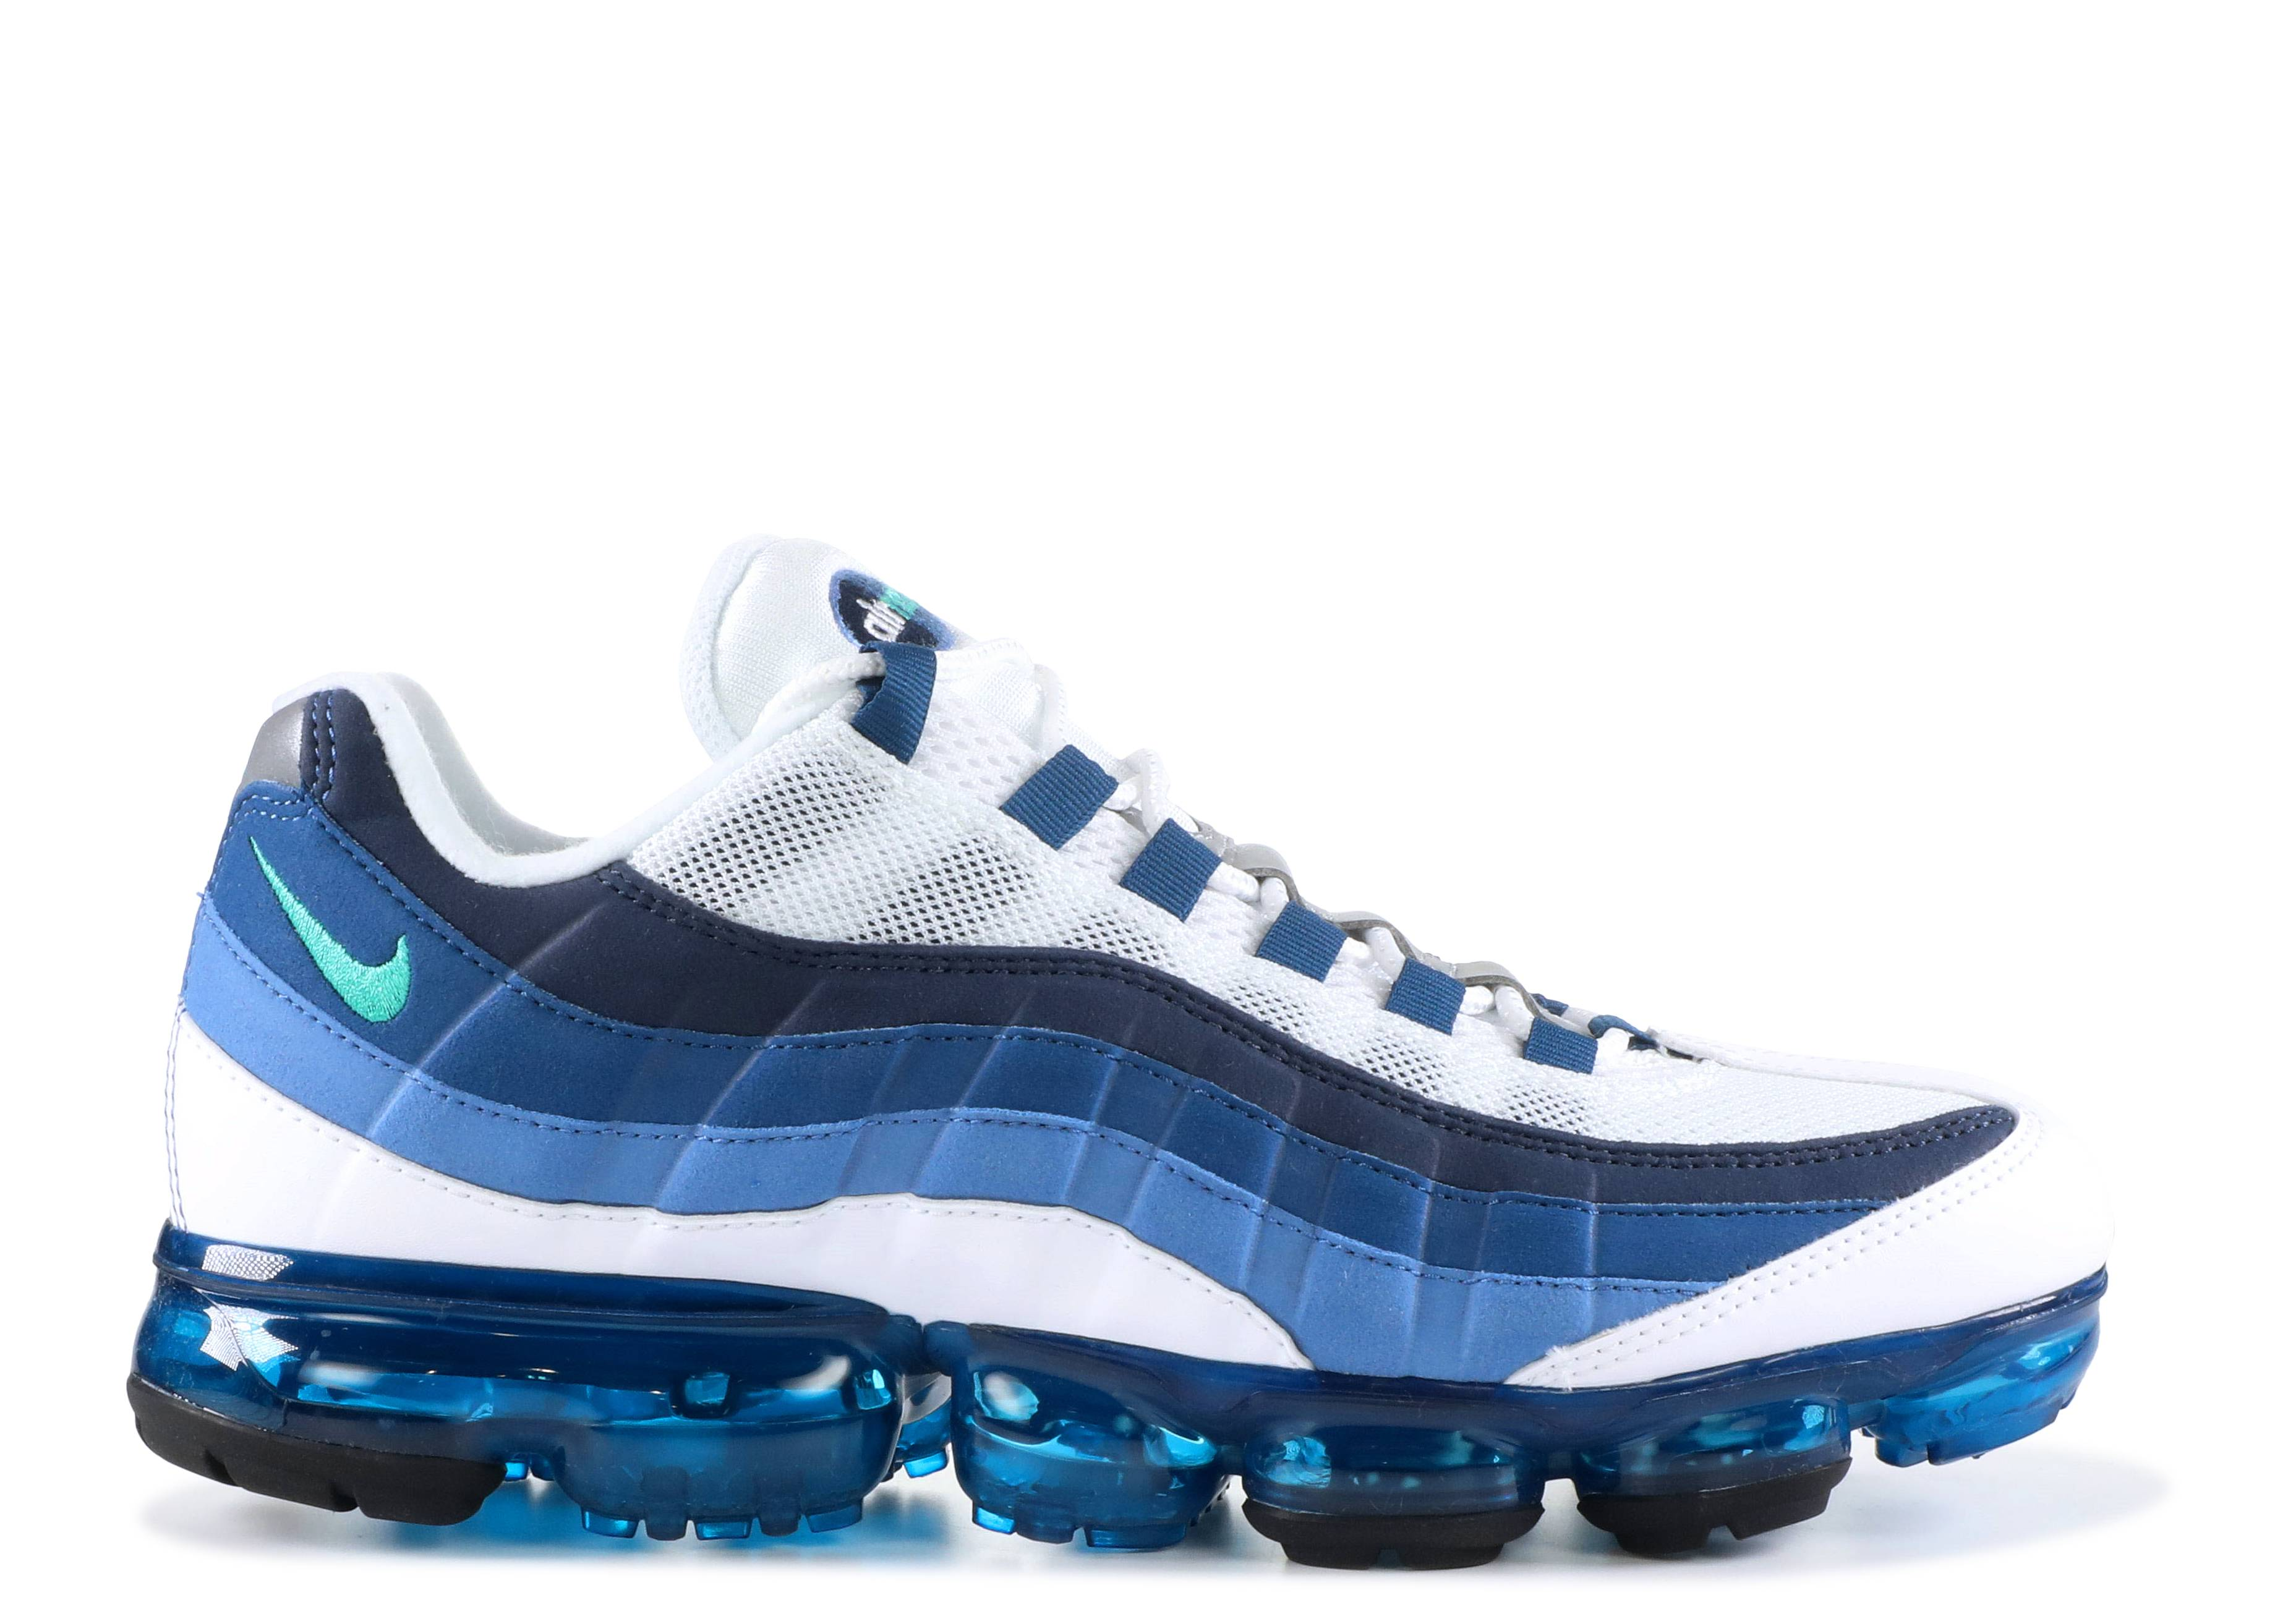 8468e00748 Air Vapormax '95 - Nike - aj7292 100 - white/new green-french blue ...